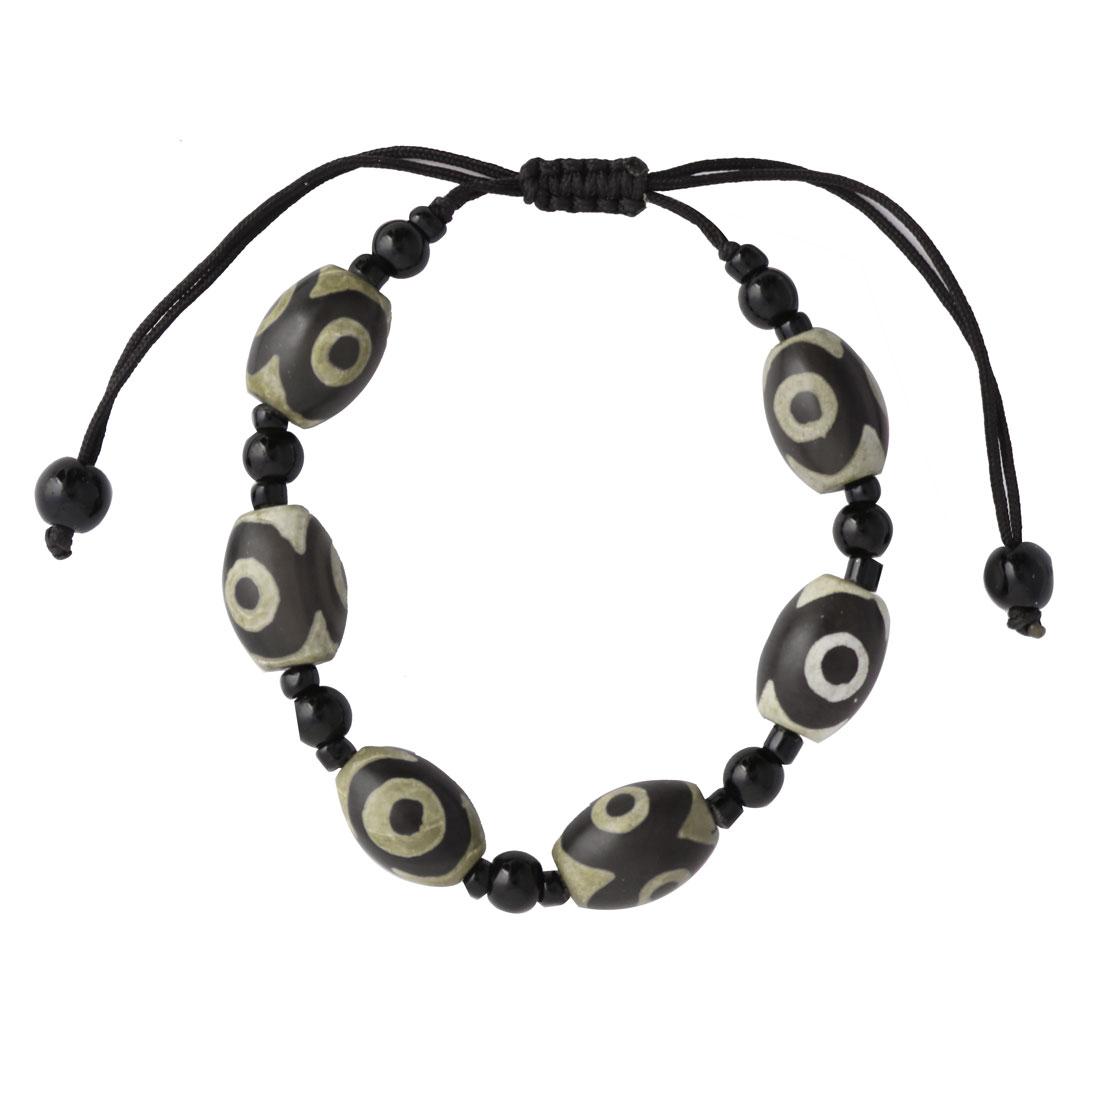 Unisex Oval Beads Eye Pattern Adjustable Jewelry Wrist Handmade Braided Bracelet